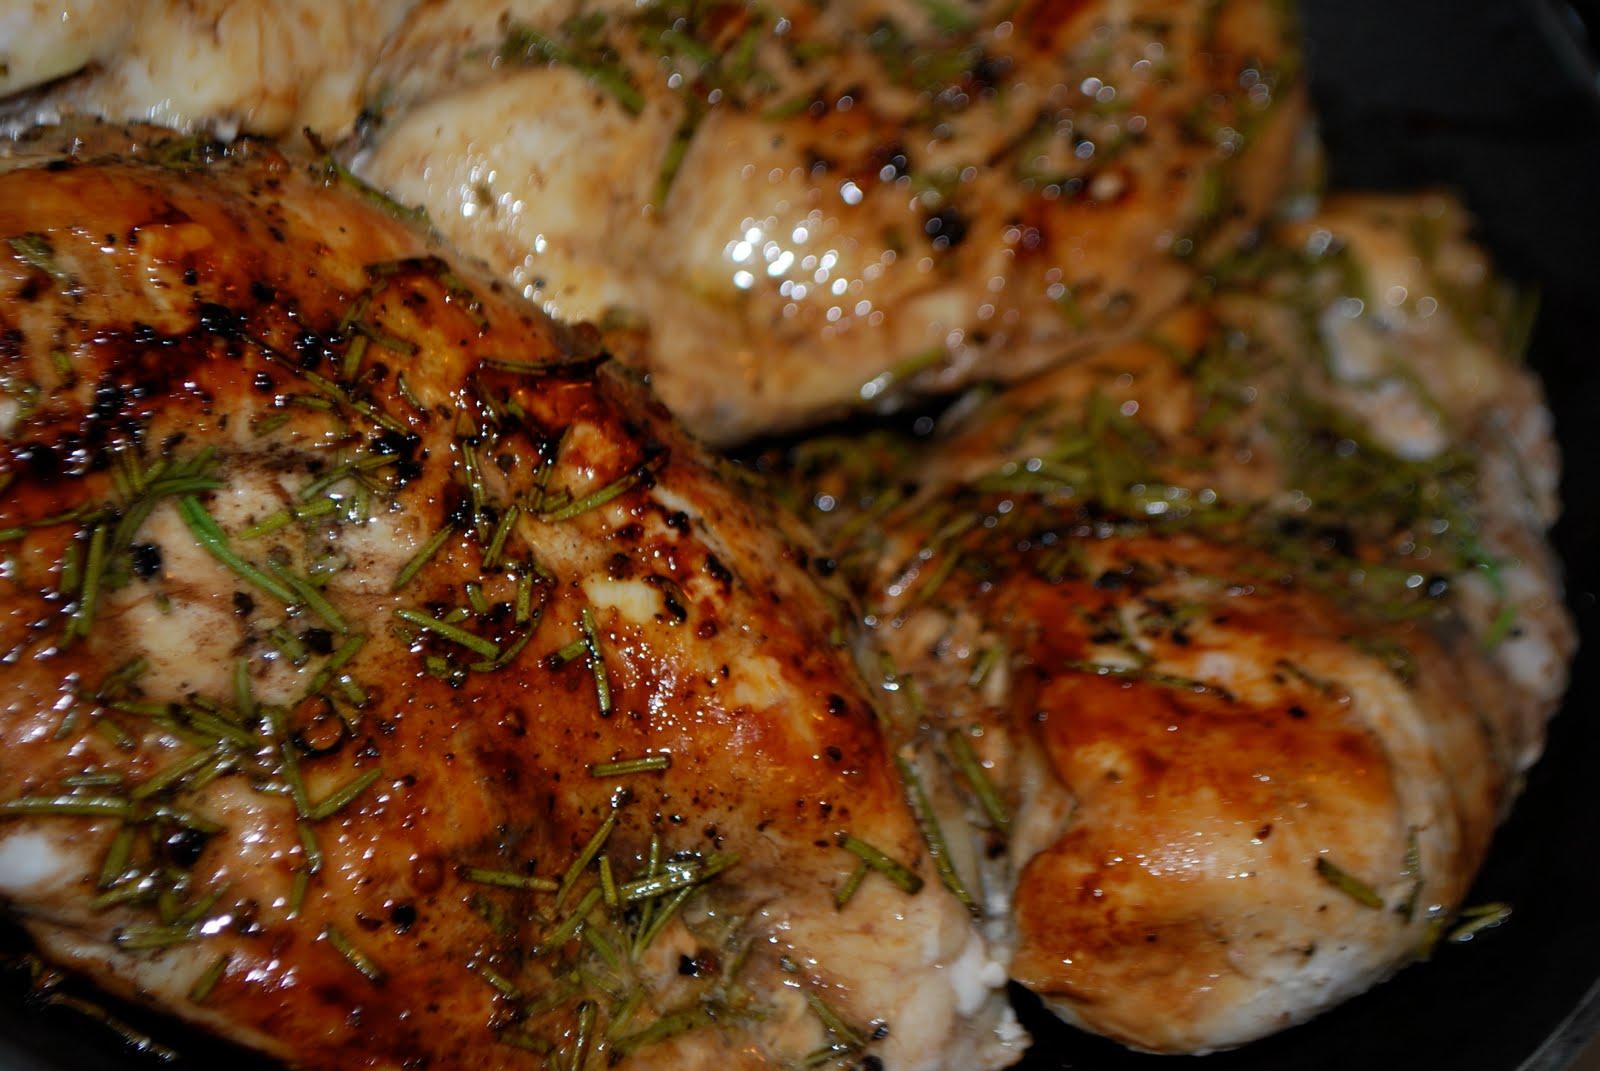 Boneless Chicken Breast Recipes With Balsamic Vinegar